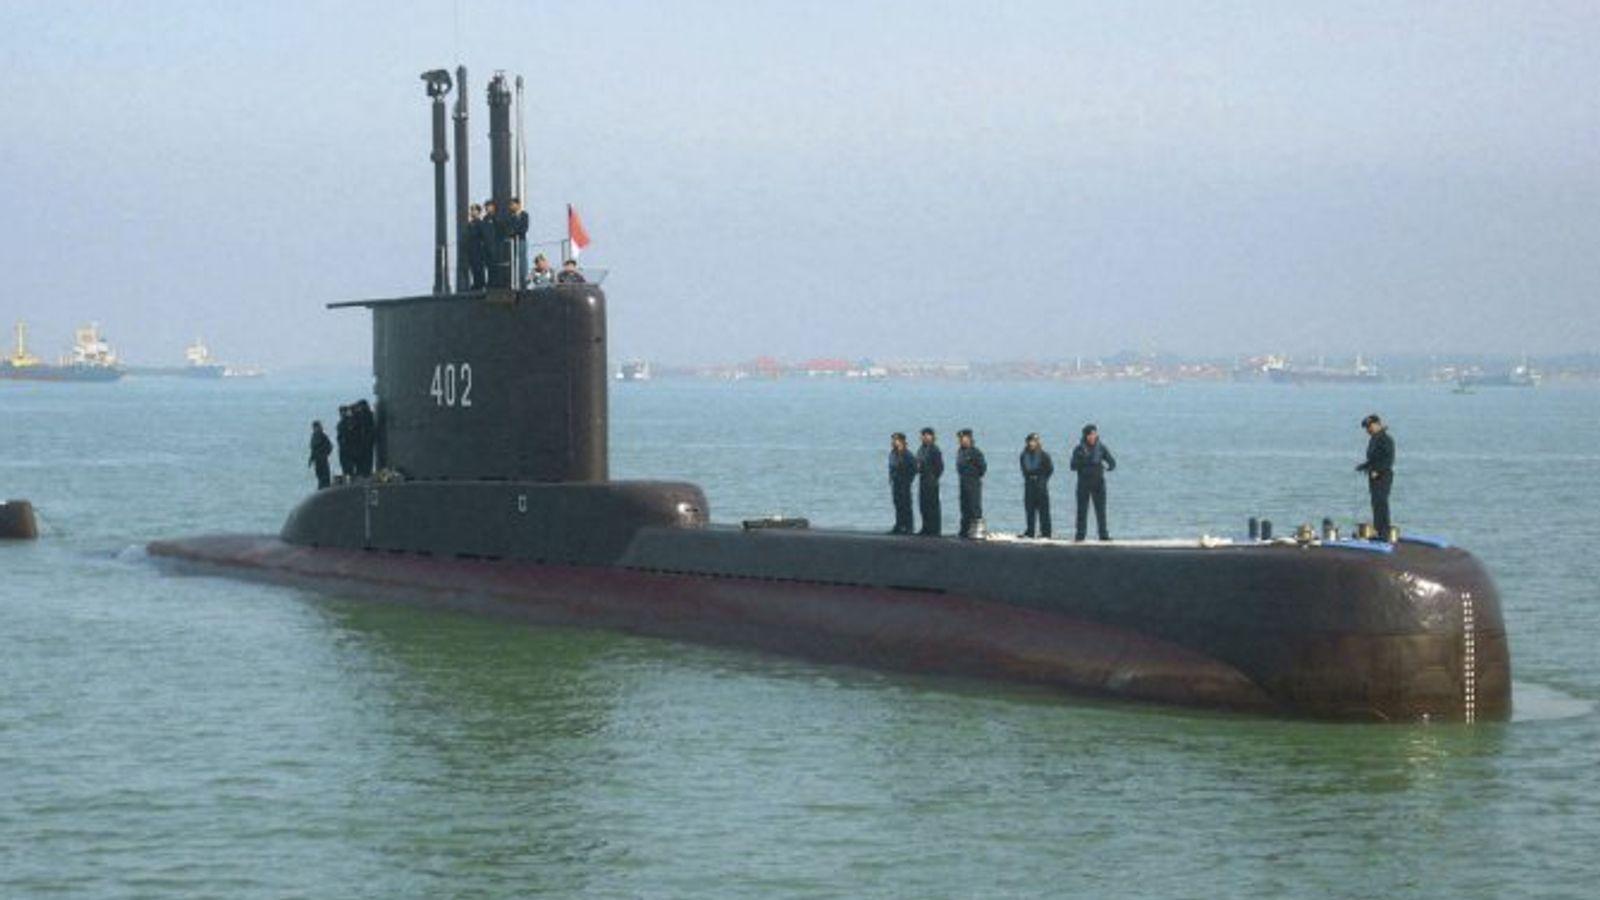 Missing Submarine KRI Nanggala Found Broken Into At Least Three Parts Off Bali